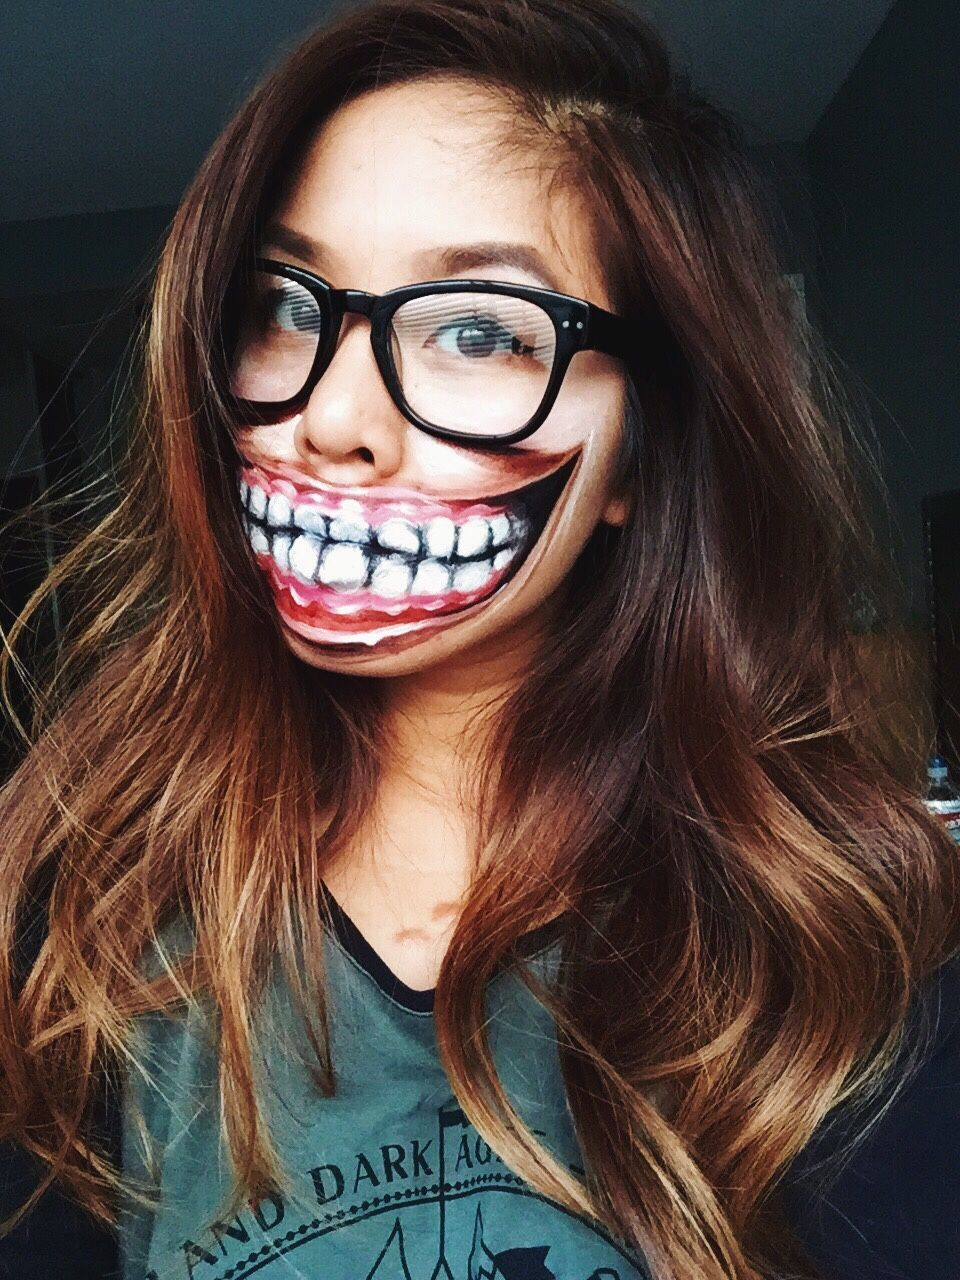 25 Totally Creepy Makeup Looks To Try This Halloween | Creepy ...